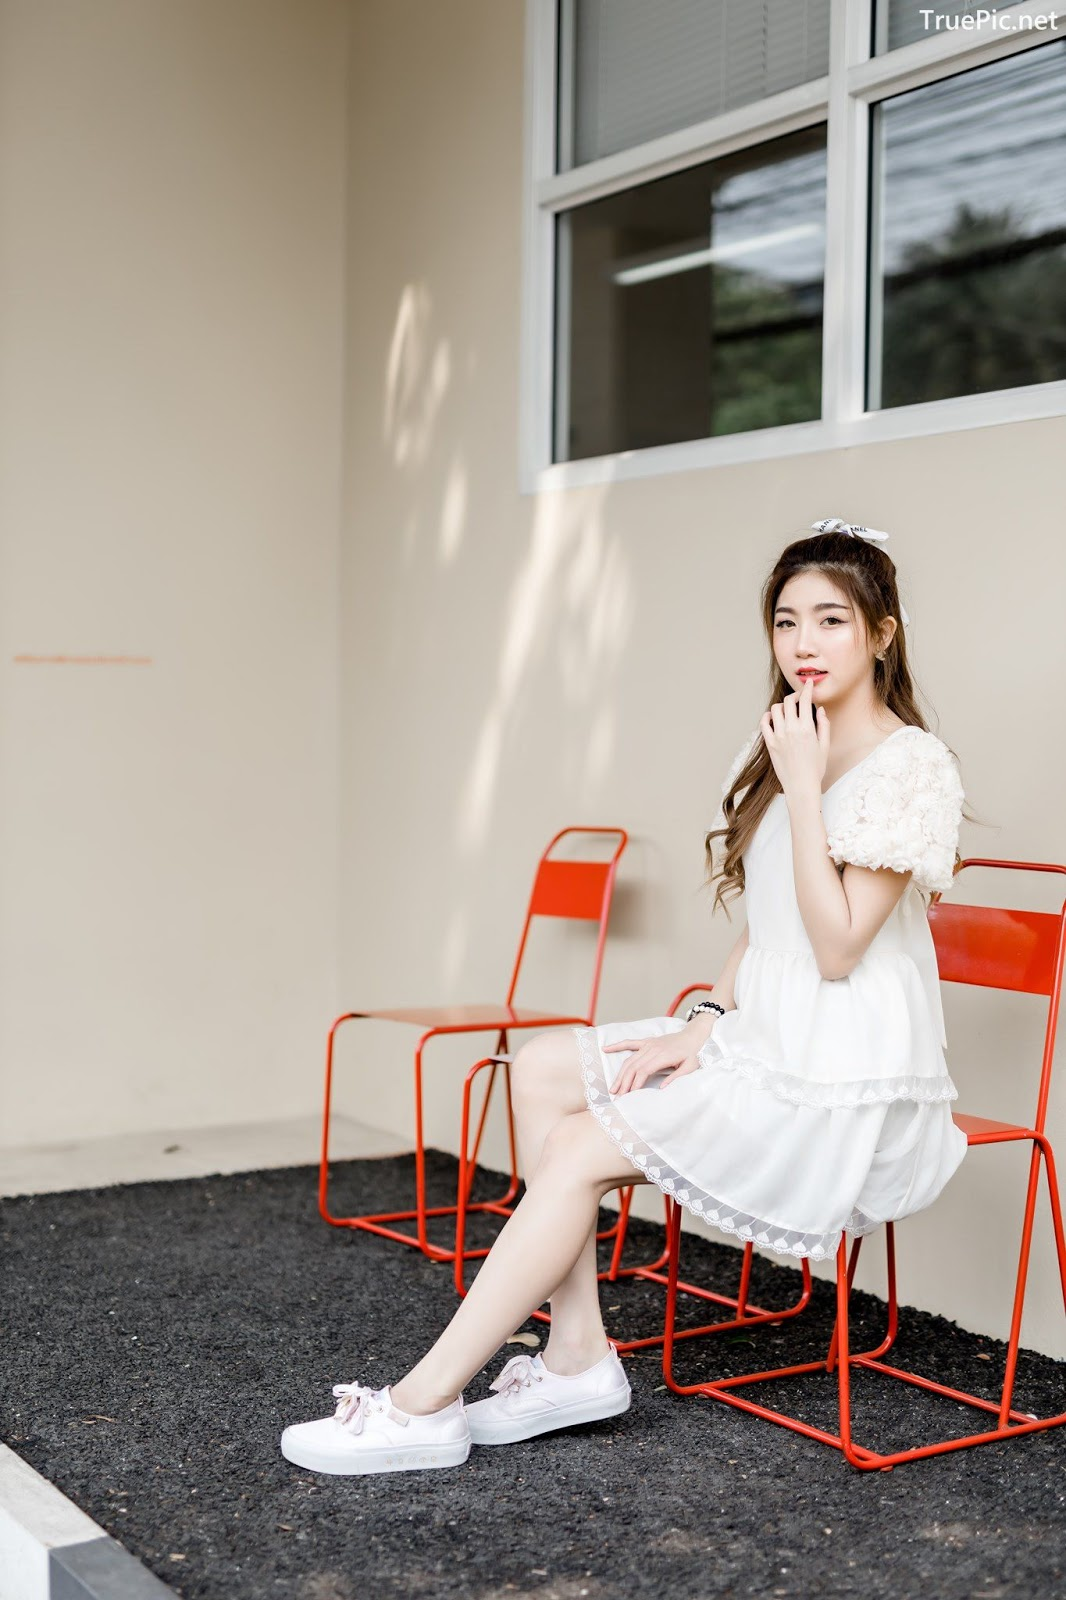 Image Thailand Model - Sasi Ngiunwan - Barbie Doll Smile - TruePic.net - Picture-12